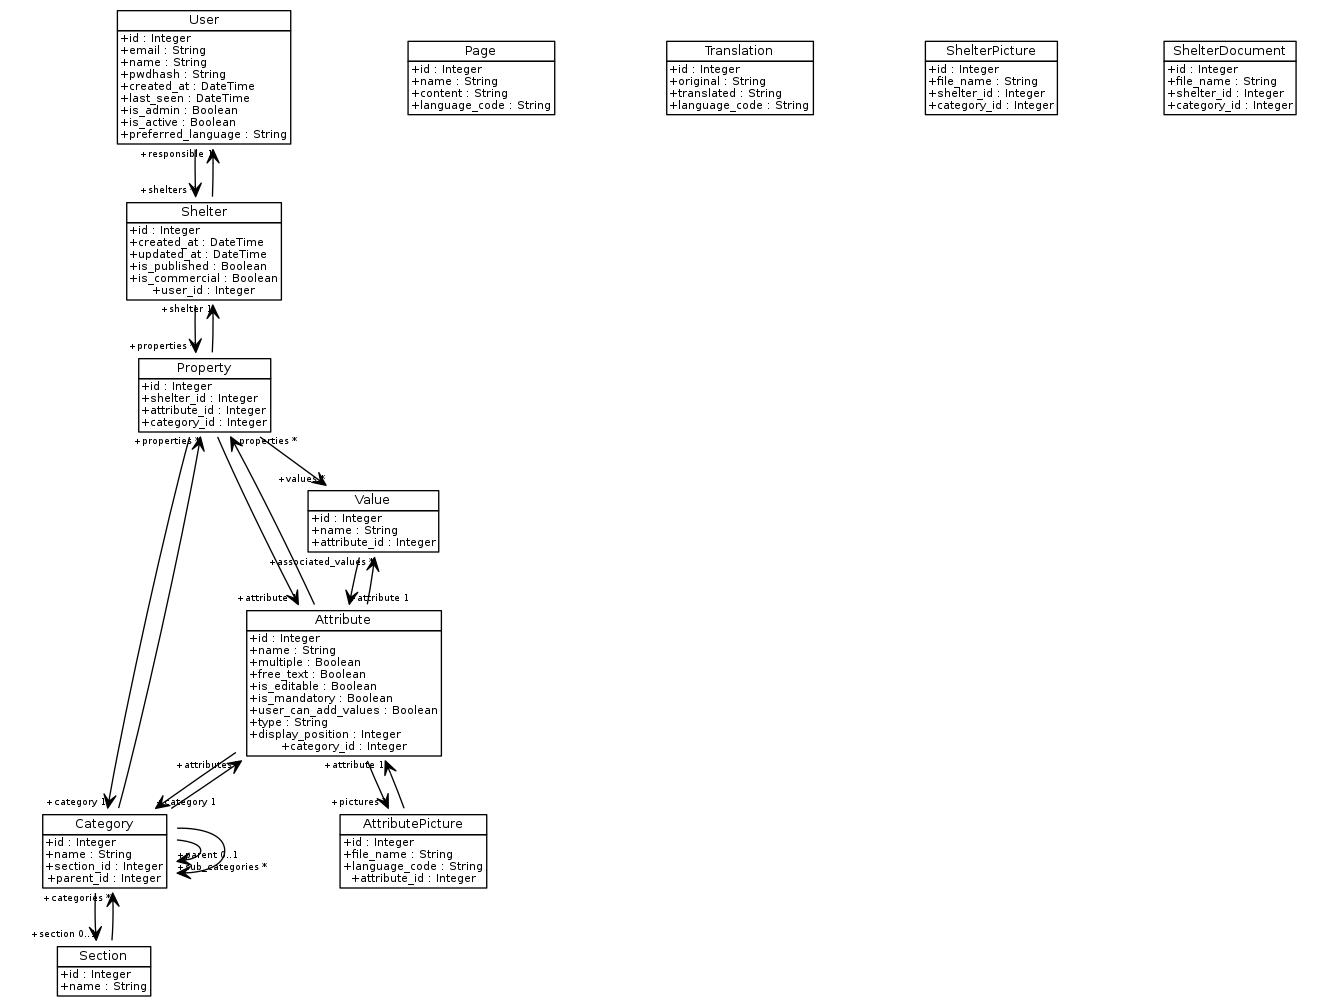 documentation/_static/uml_graph.png